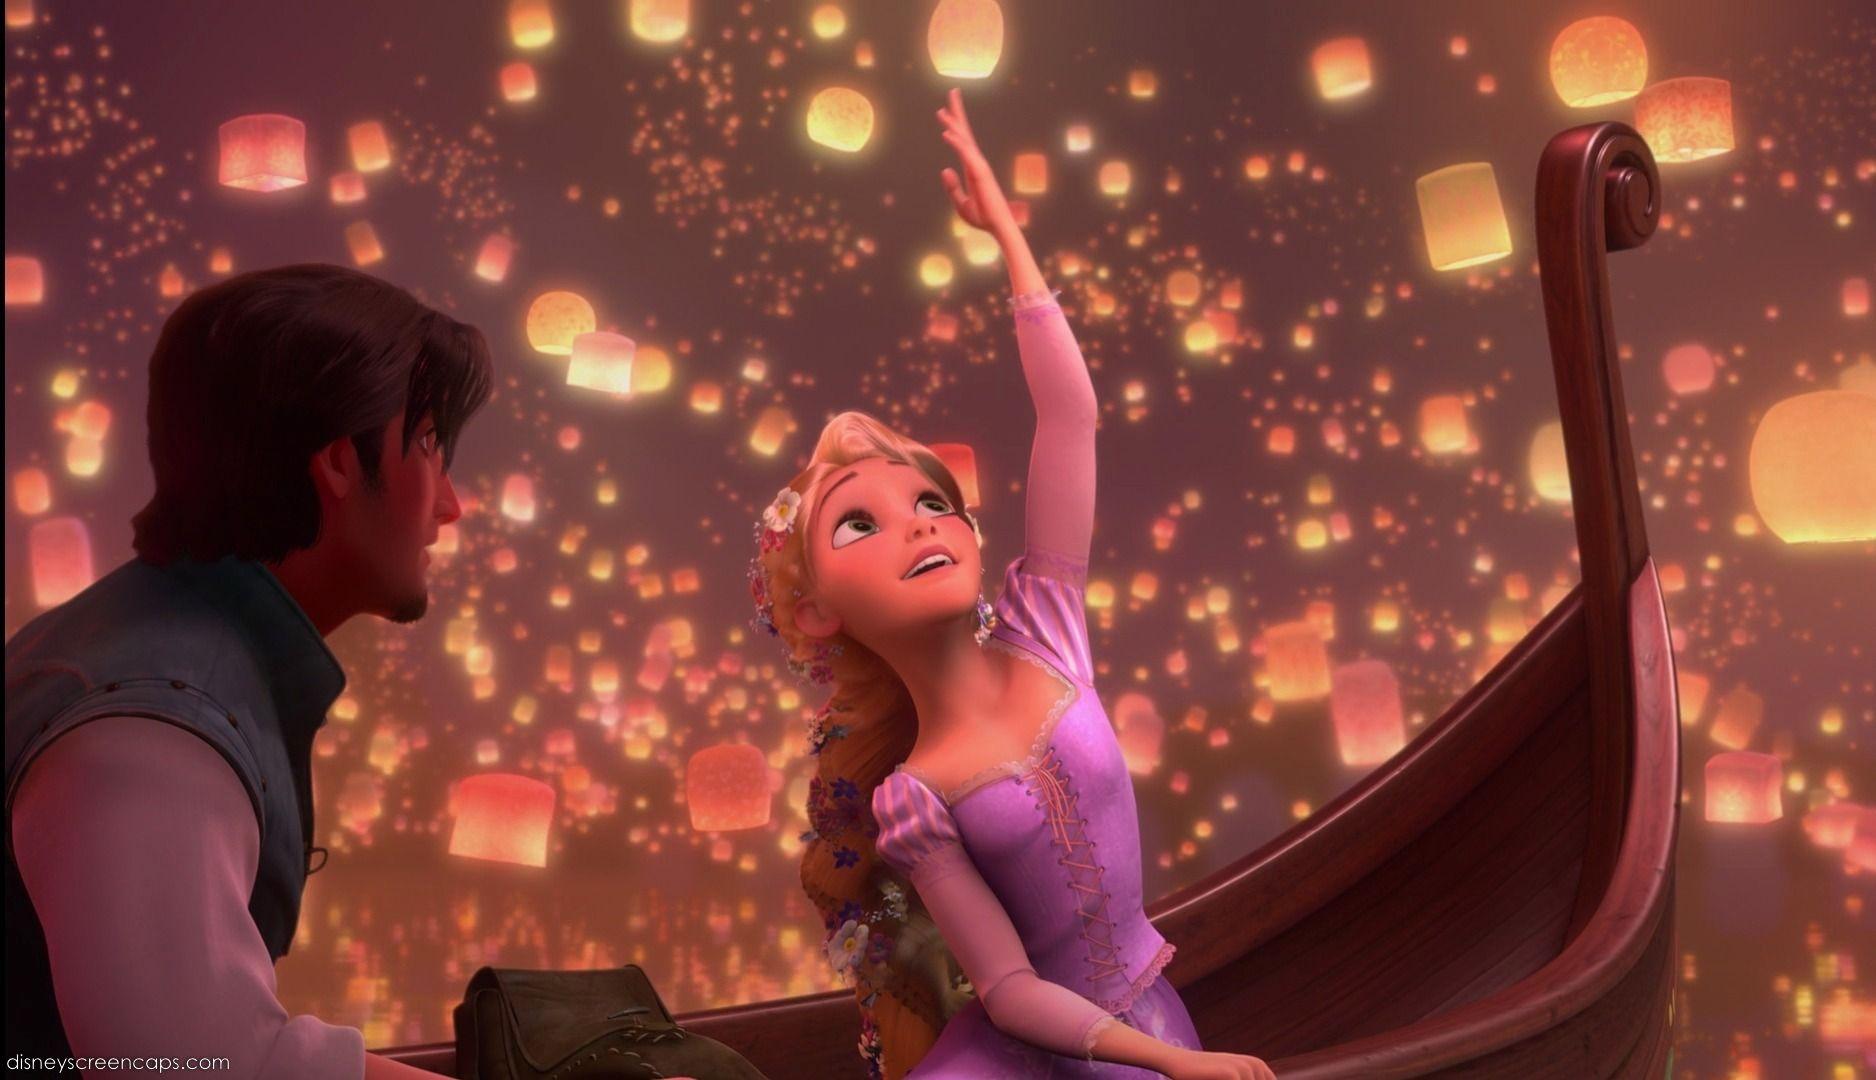 Pin By Tiana Reitano On Disney Princess Disney Tangled Tangled Movie Tangled Lanterns Scene